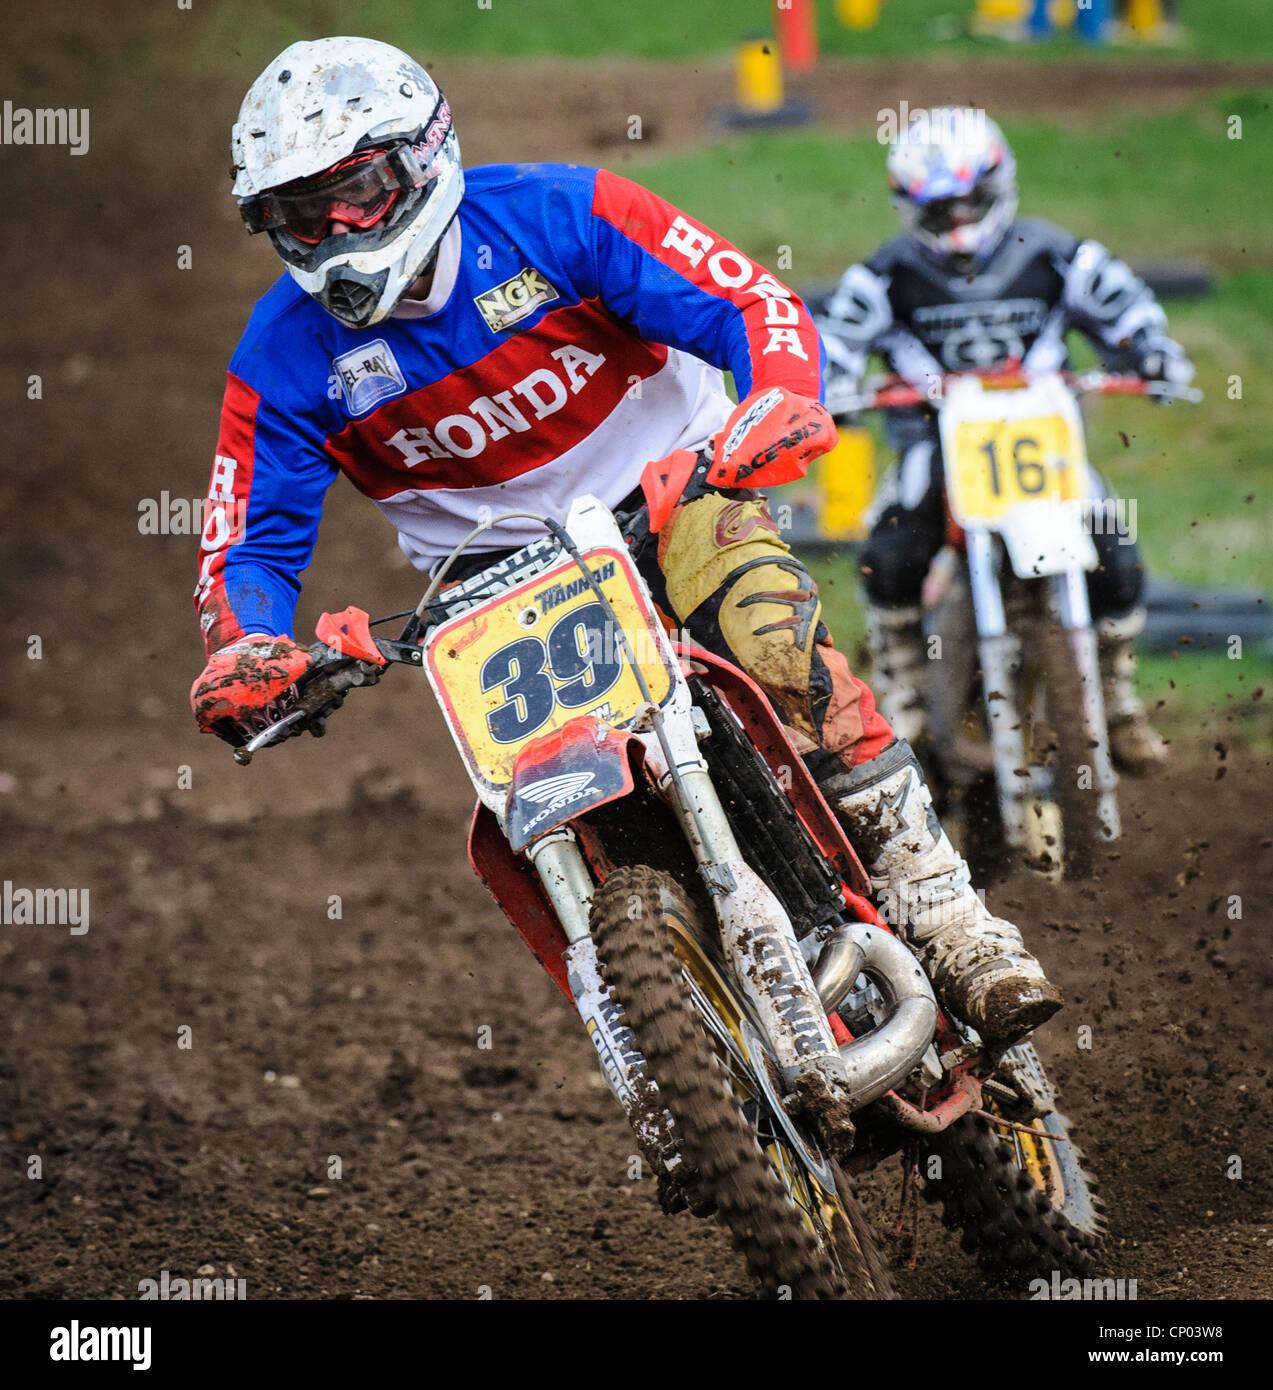 Motocross-Action in Tinto Park South Lanarkshire, Schottland Stockbild